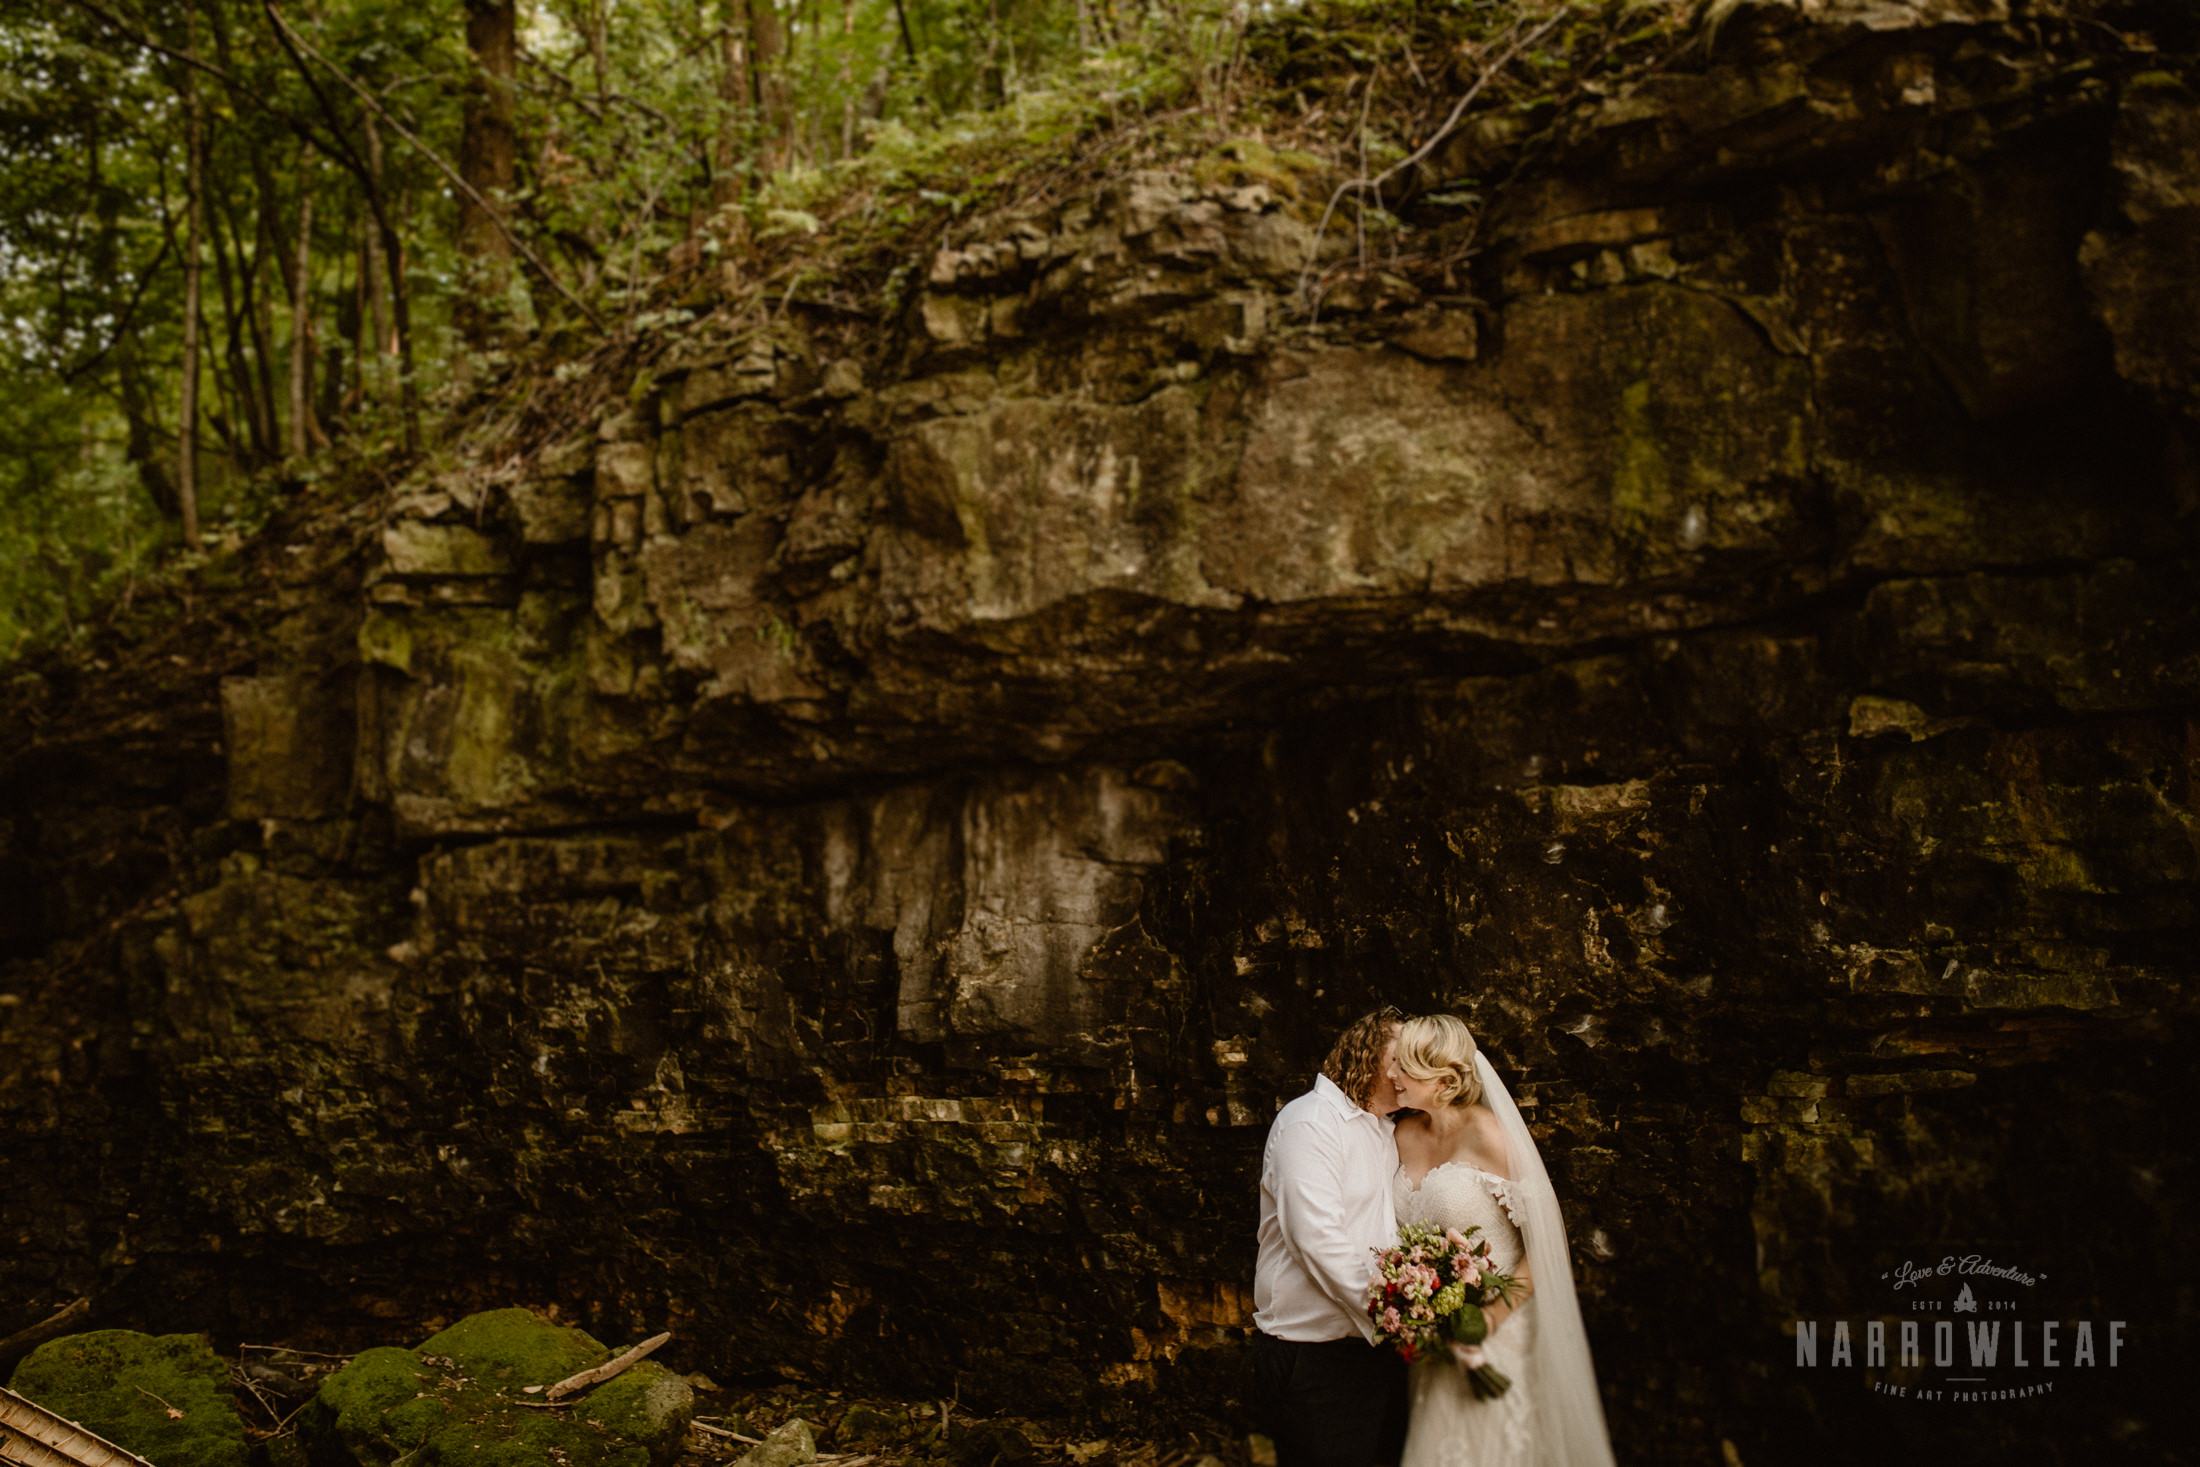 wisconsin-wedding-photographer-Narrowleaf_Love_and_Adventure_Photography-2900.jpg